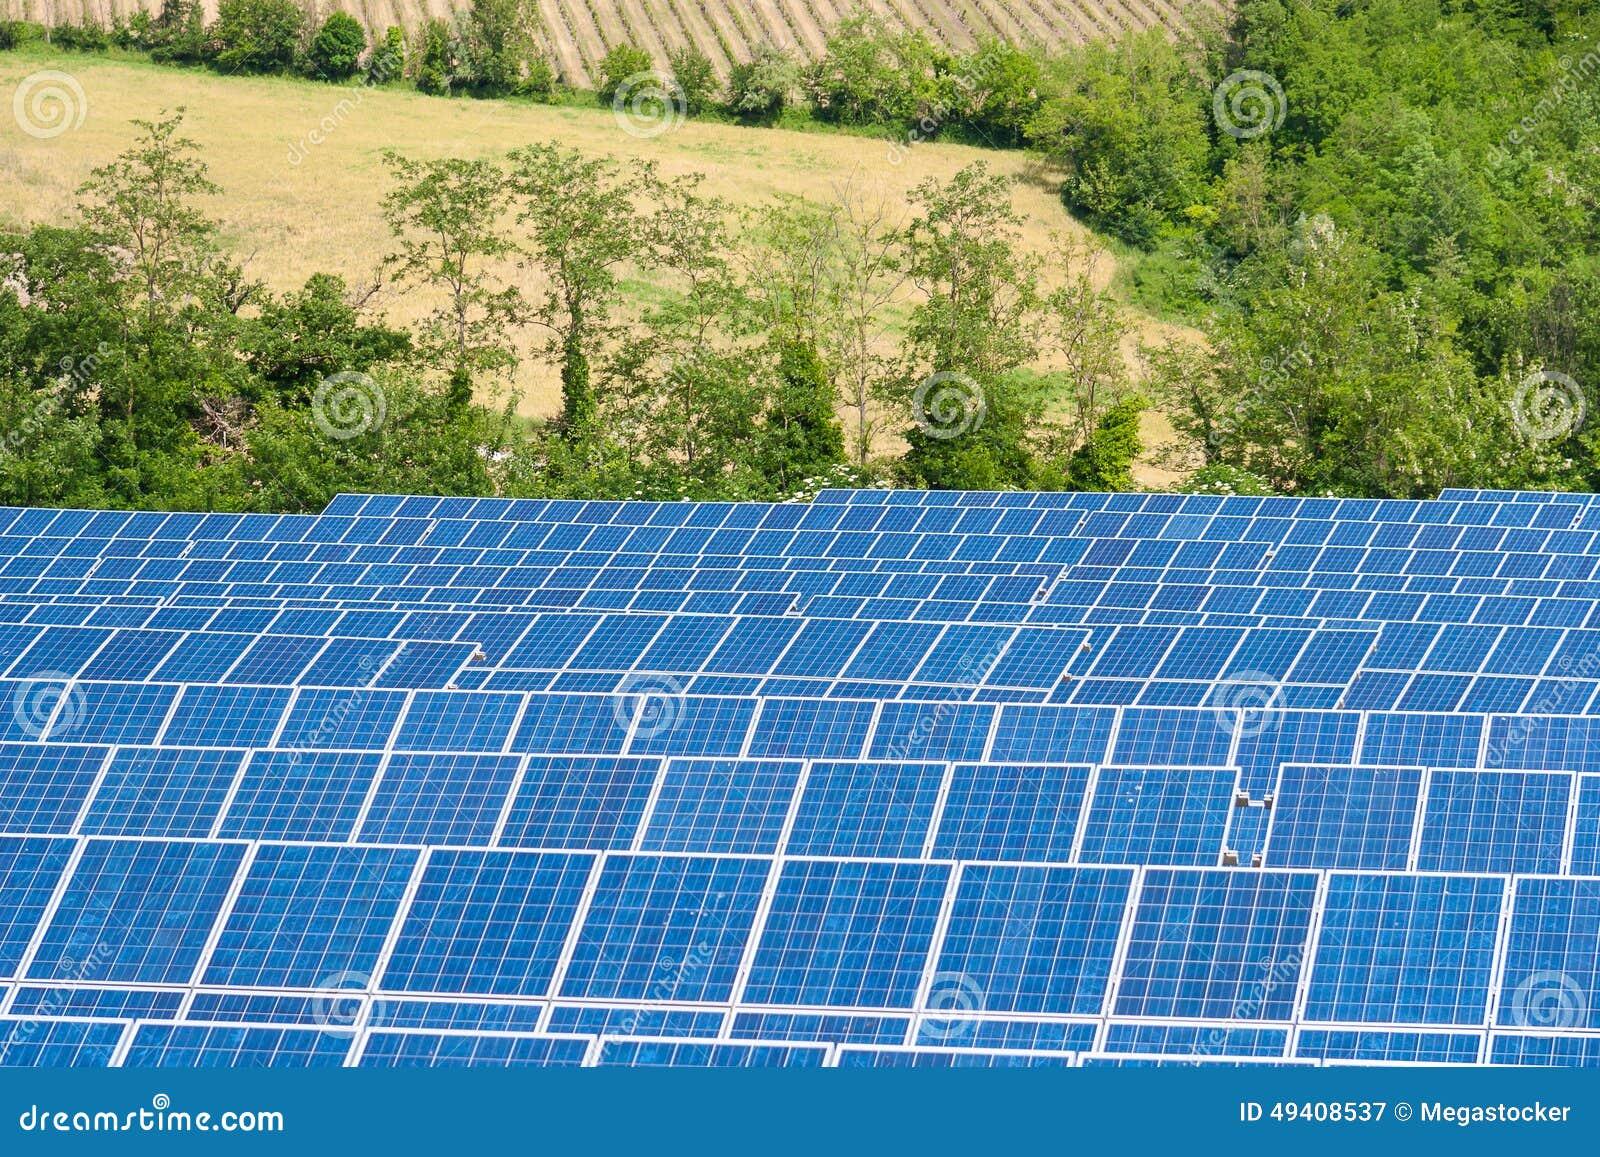 Download Blaue Solarenergie-Platten stockbild. Bild von ladung - 49408537